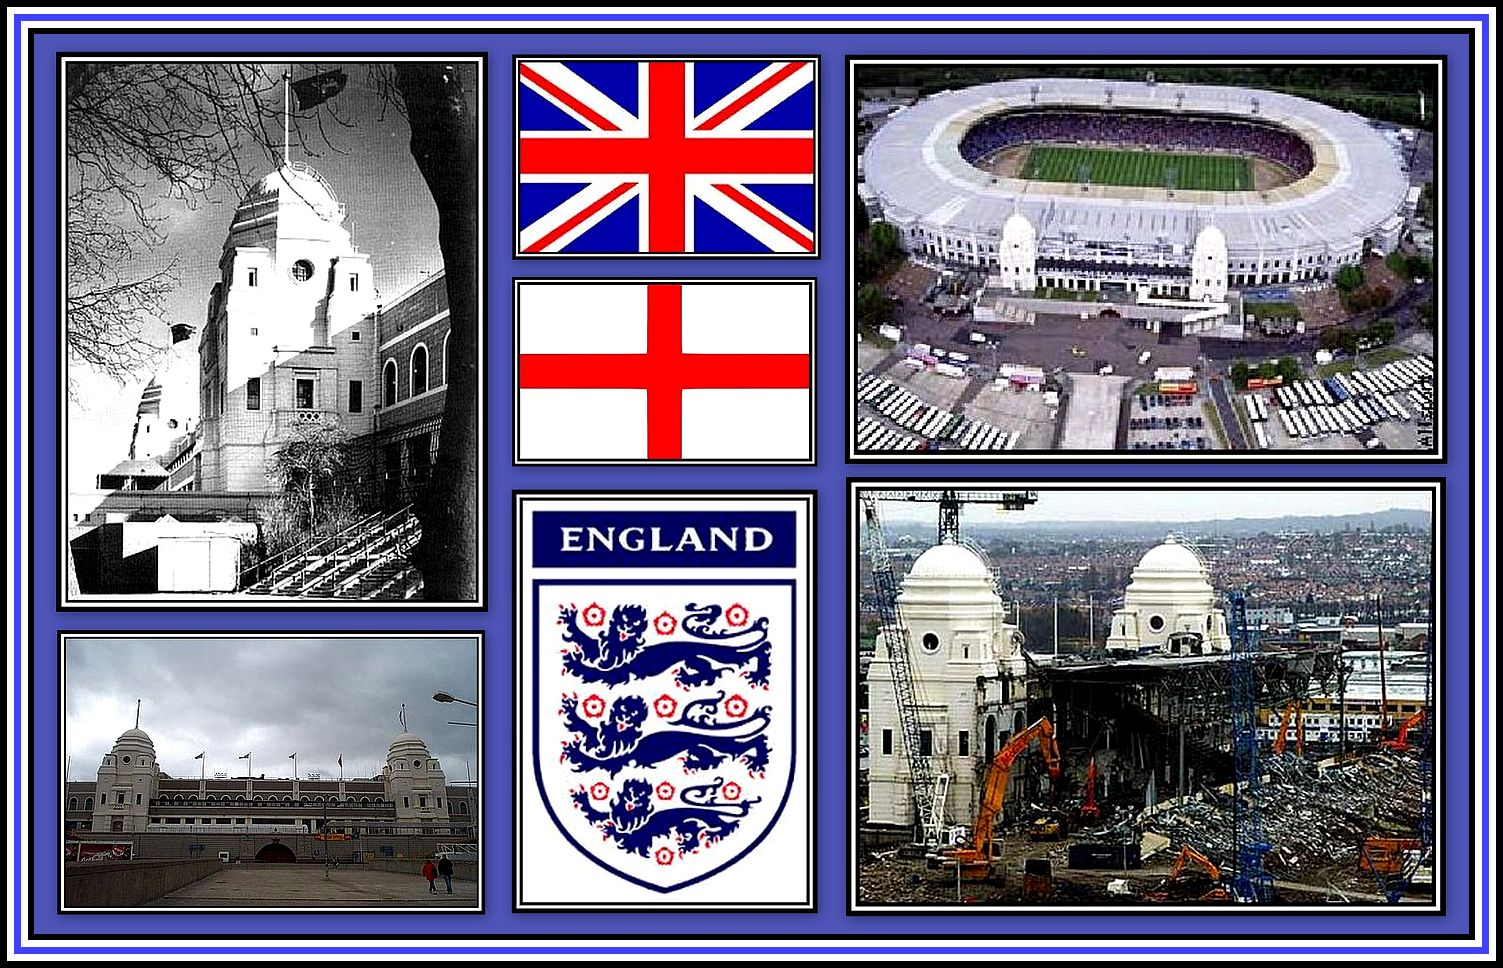 Old Wembley Stadium Collage